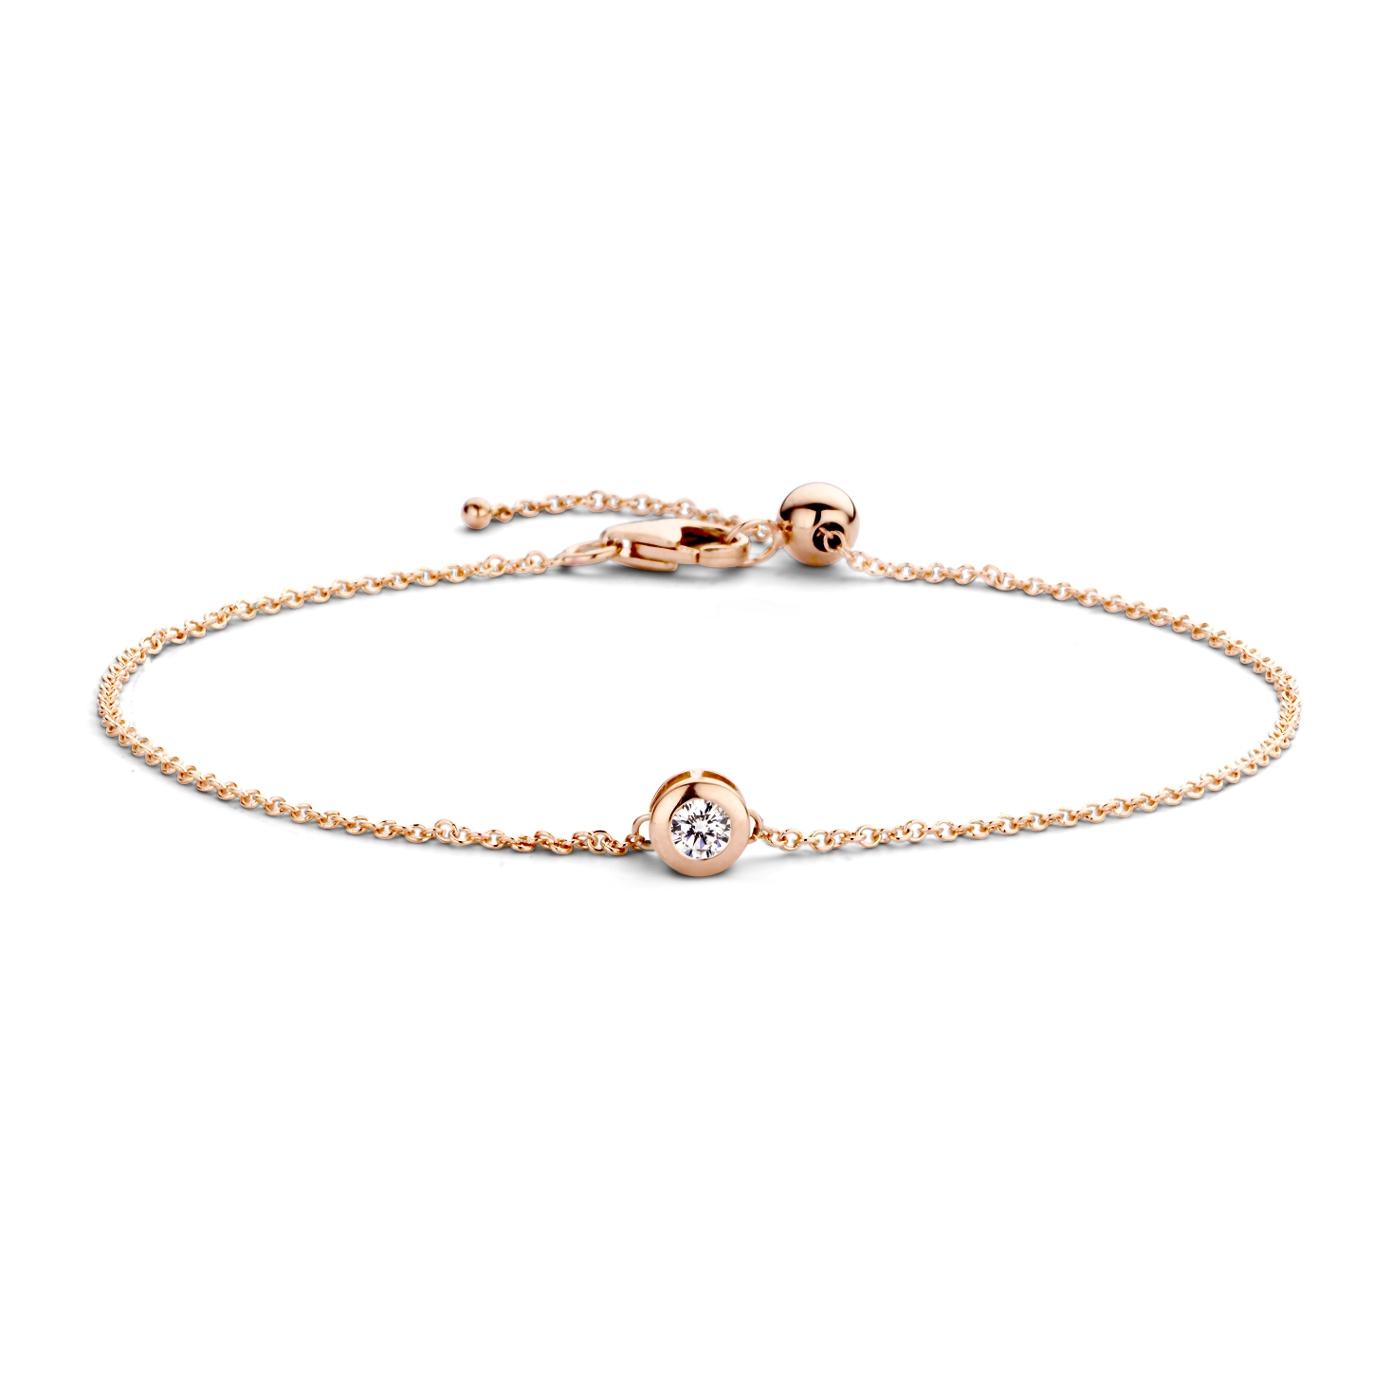 Afbeelding van Blush 14 Karaat Gouden Armband 2167RZI (Lengte: 18.00 cm)